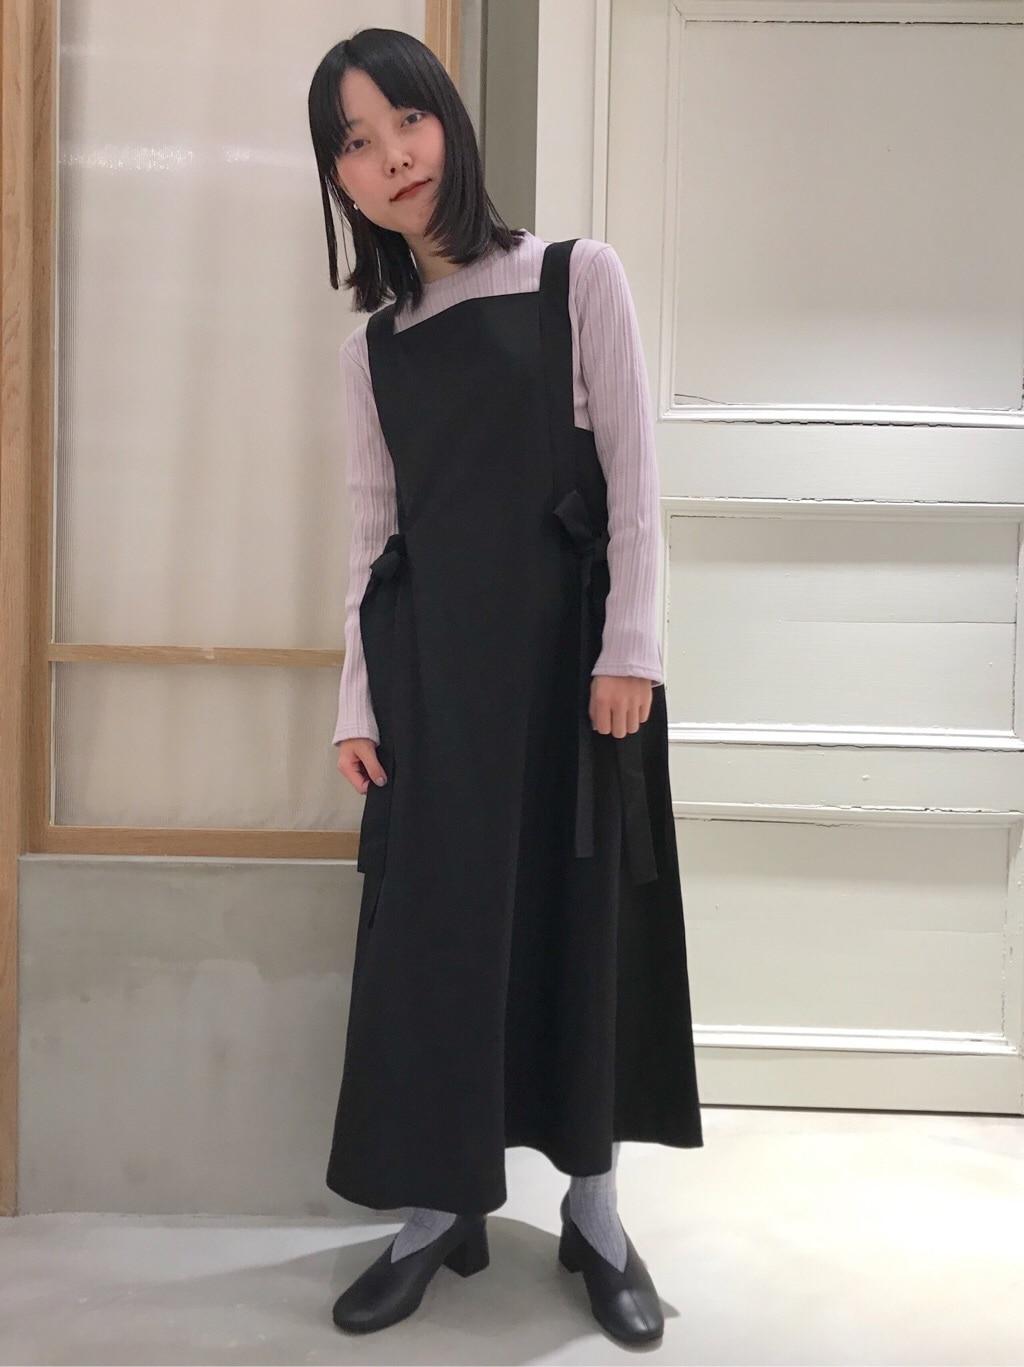 bulle de savon 渋谷スクランブルスクエア 身長:153cm 2020.02.07